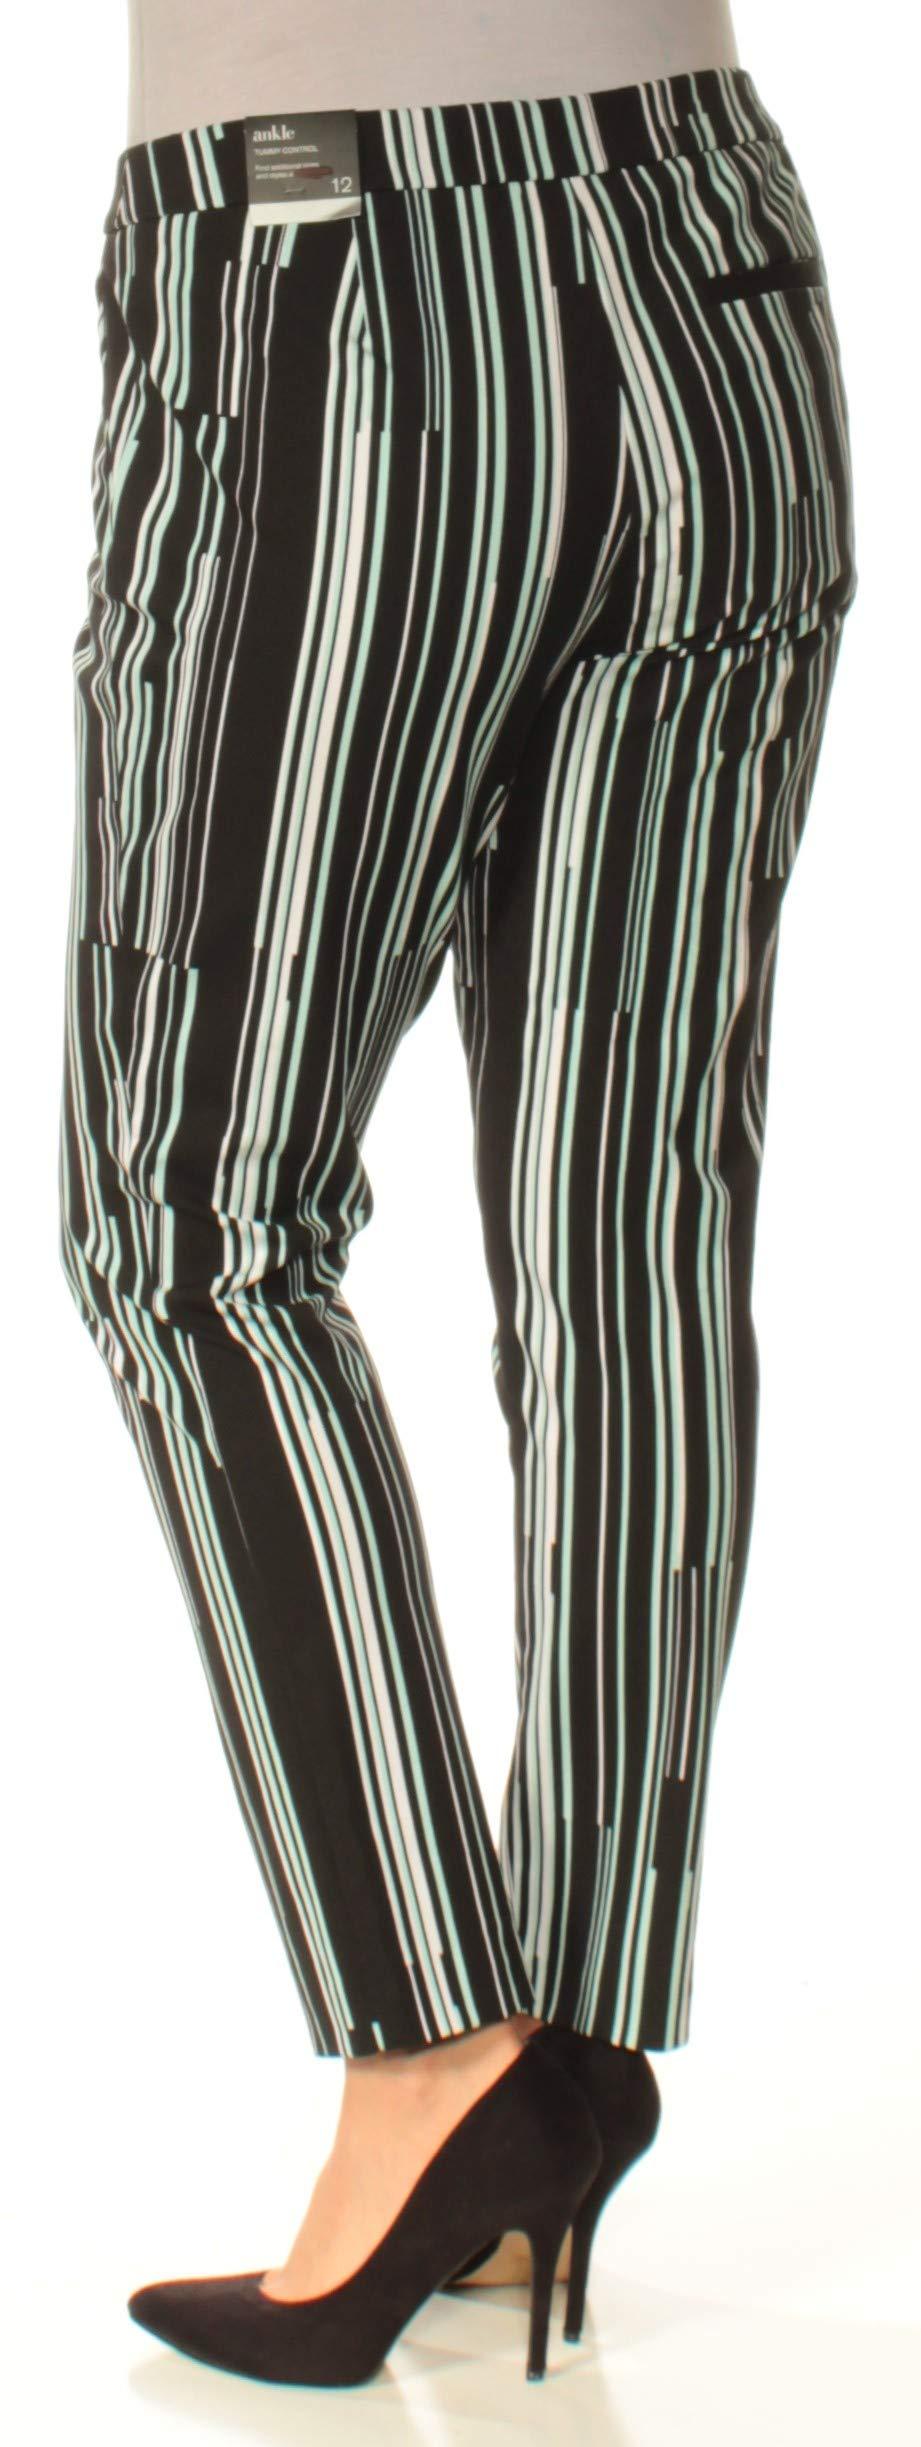 Alfani Womens Striped Ankle Skinny Pants Black 14 by Alfani (Image #2)